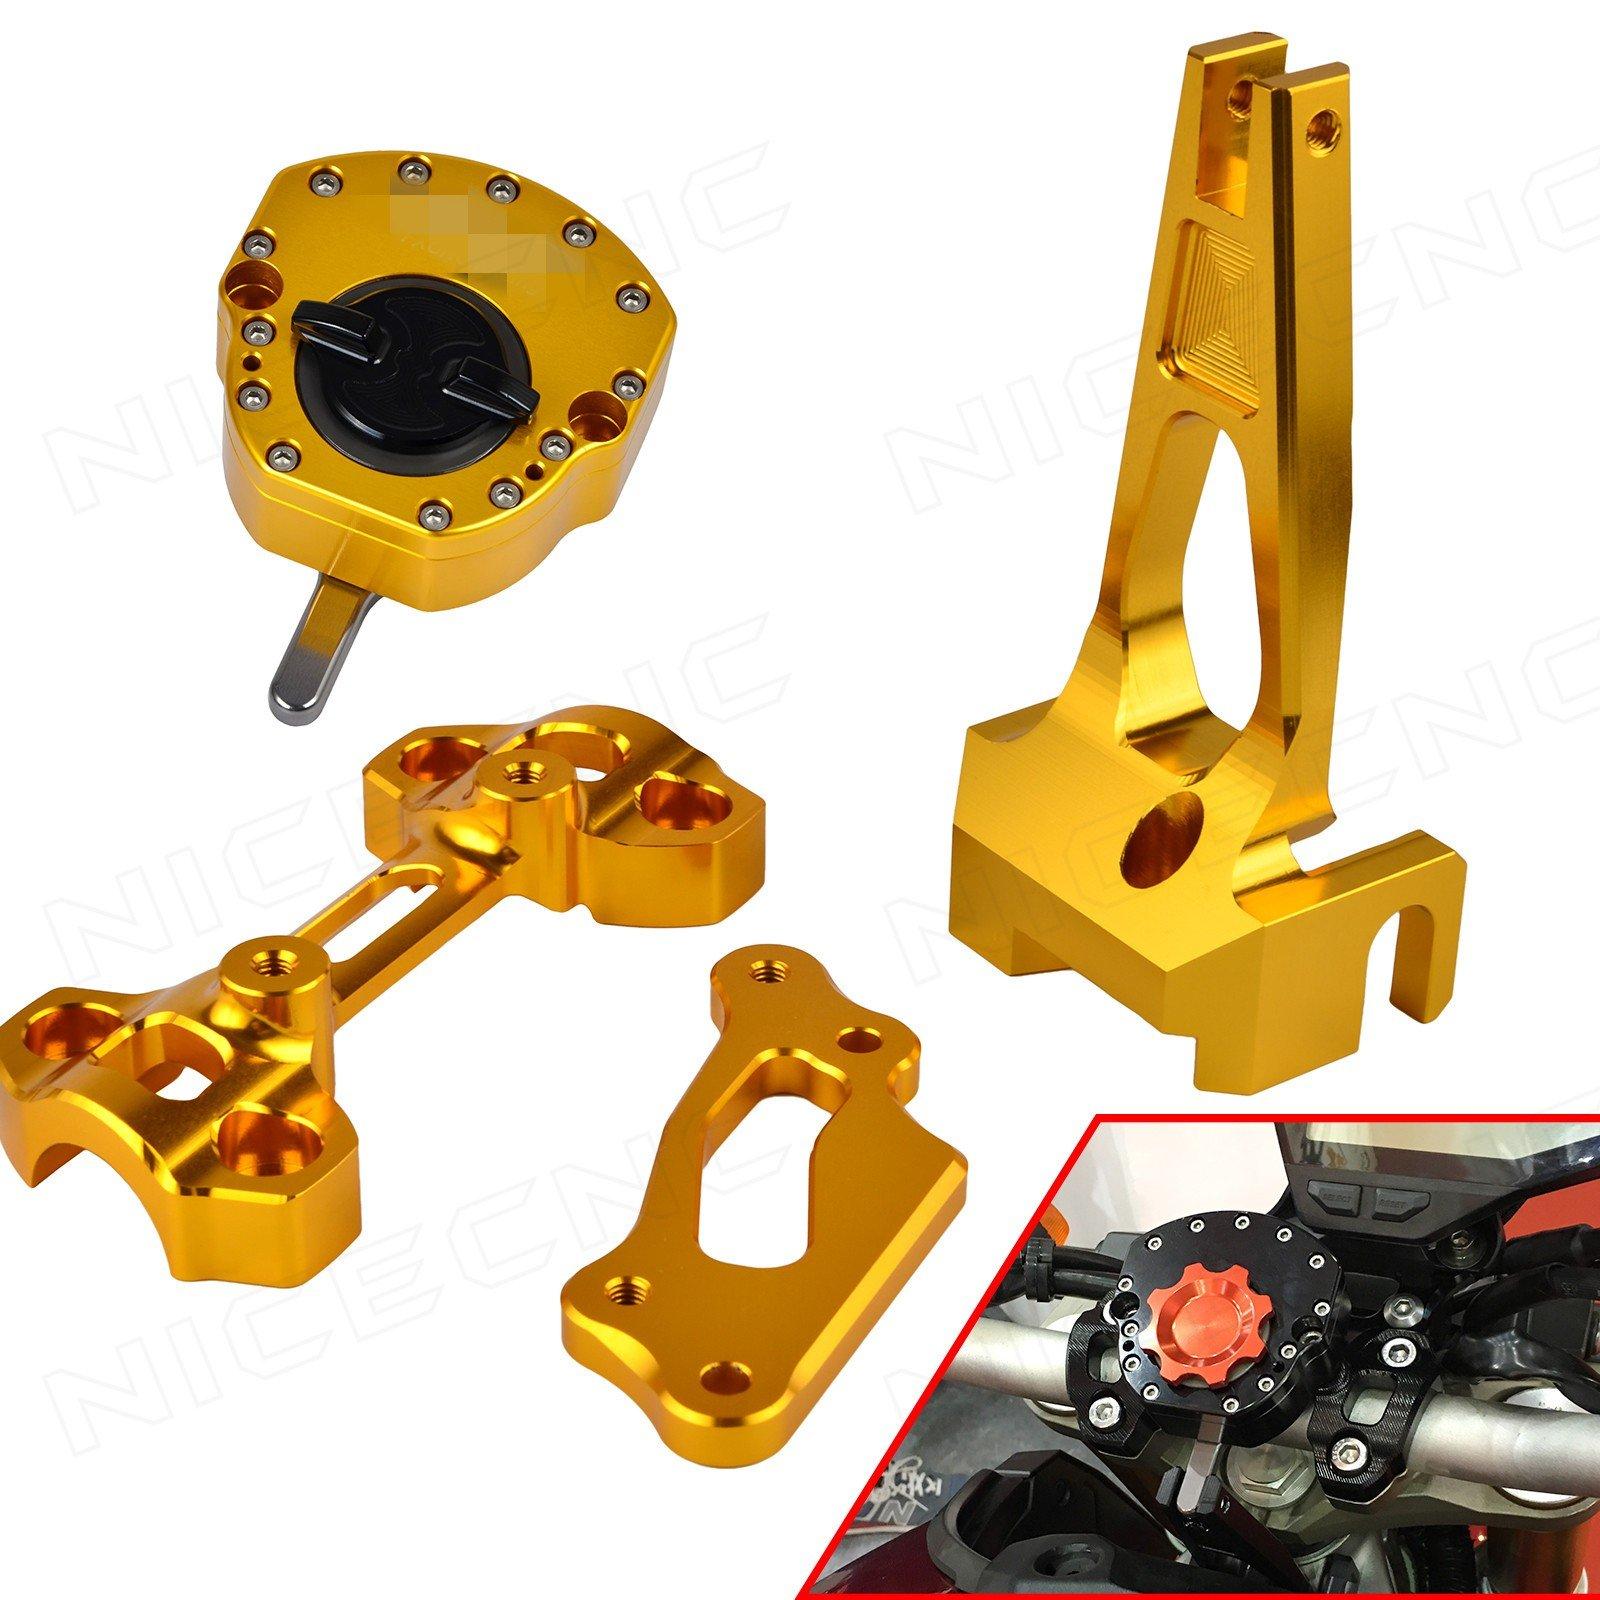 NICECNC Gold Steering Stabilizer Damper & Mounting Bracket Set for MT09/MT-09 Street Rally FZ09 FZ-09 2014 2015 2016